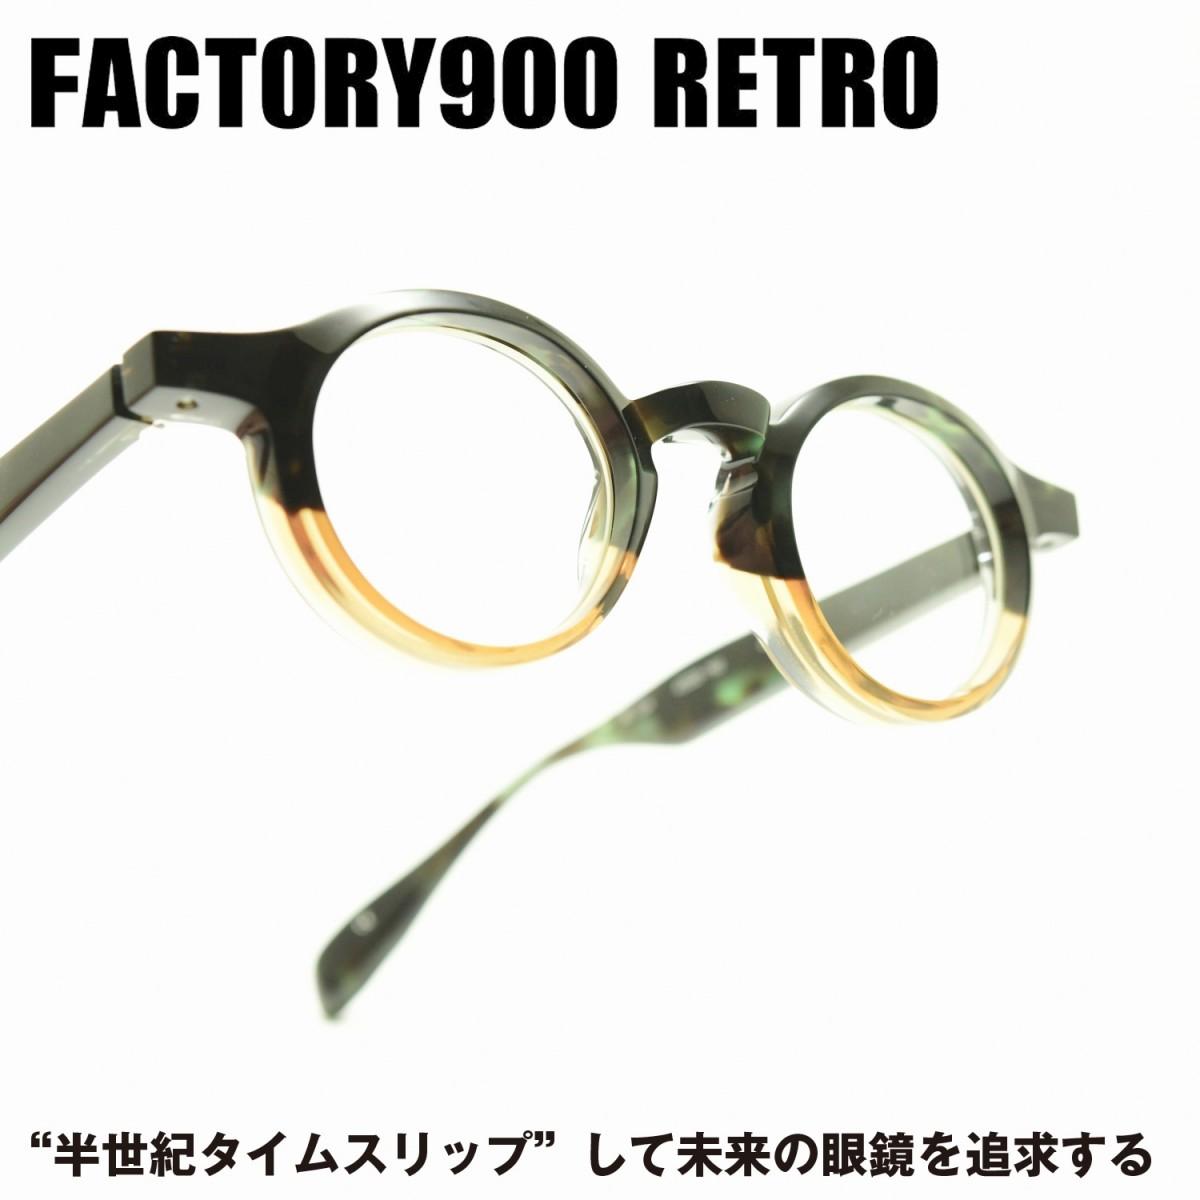 FACTORY900 RETRO ファクトリー900レトロRF-004 col-522